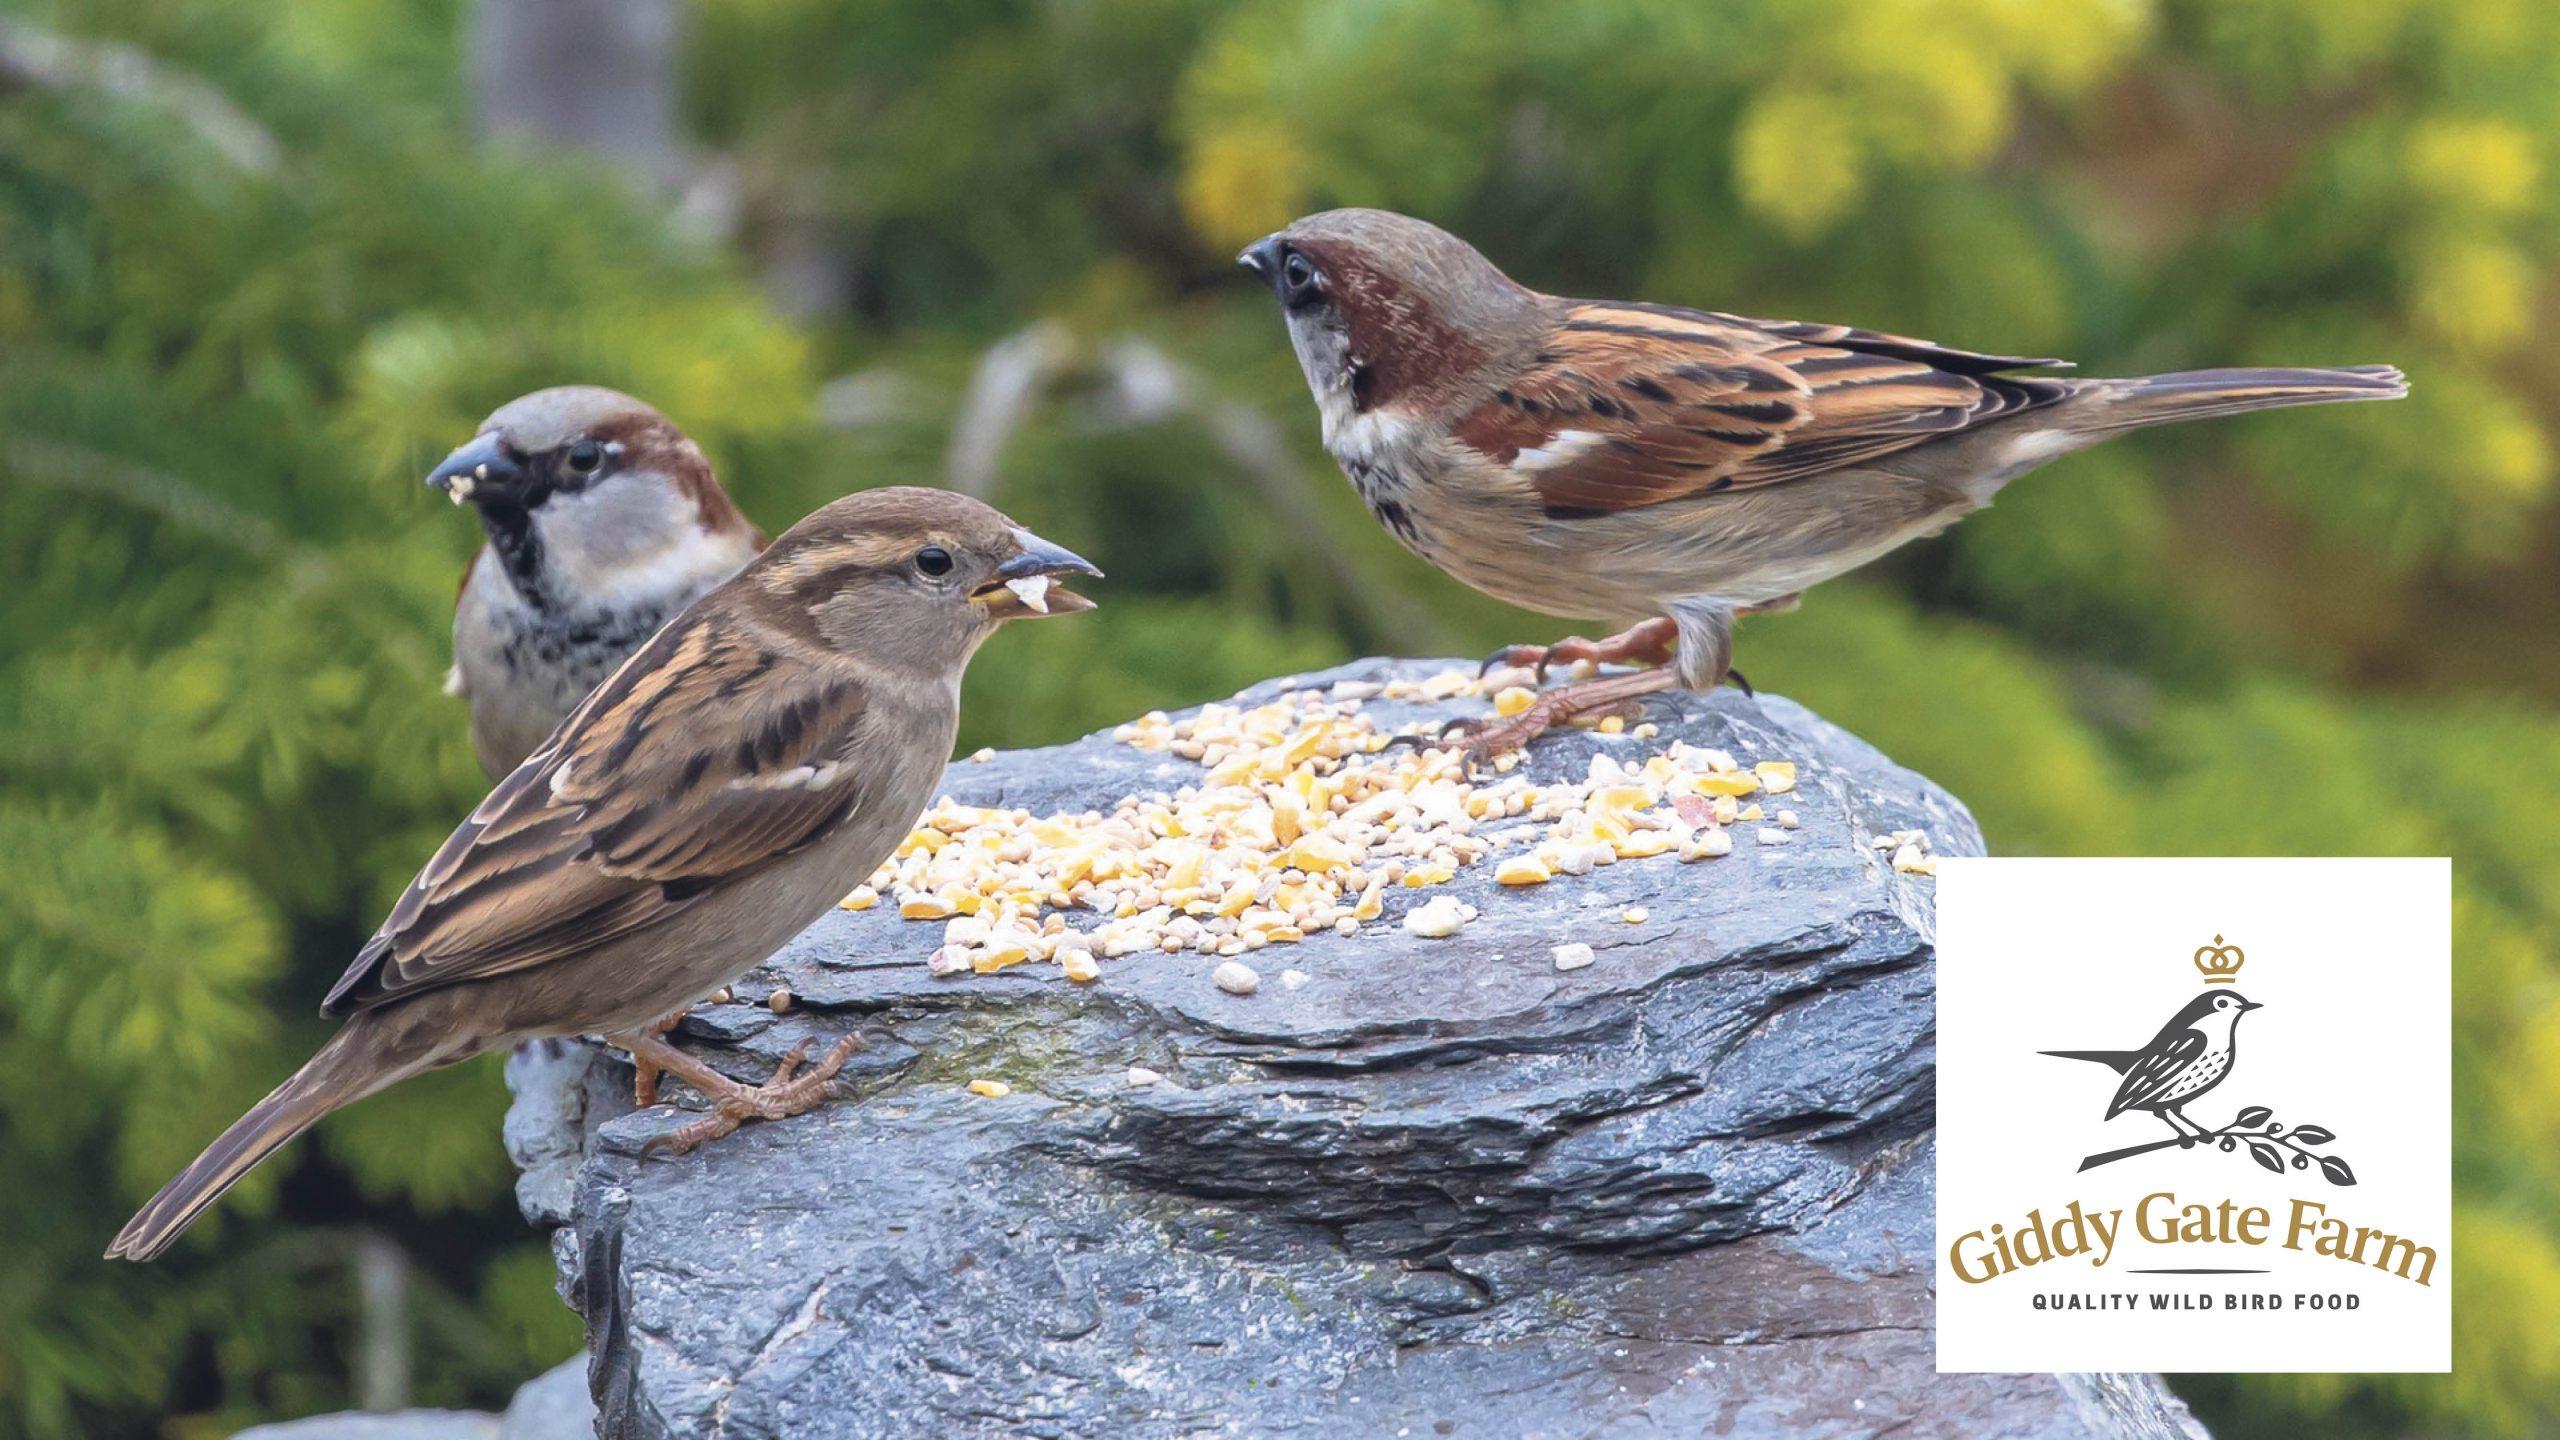 Win a bird feeding bundle for your garden Worth £130!